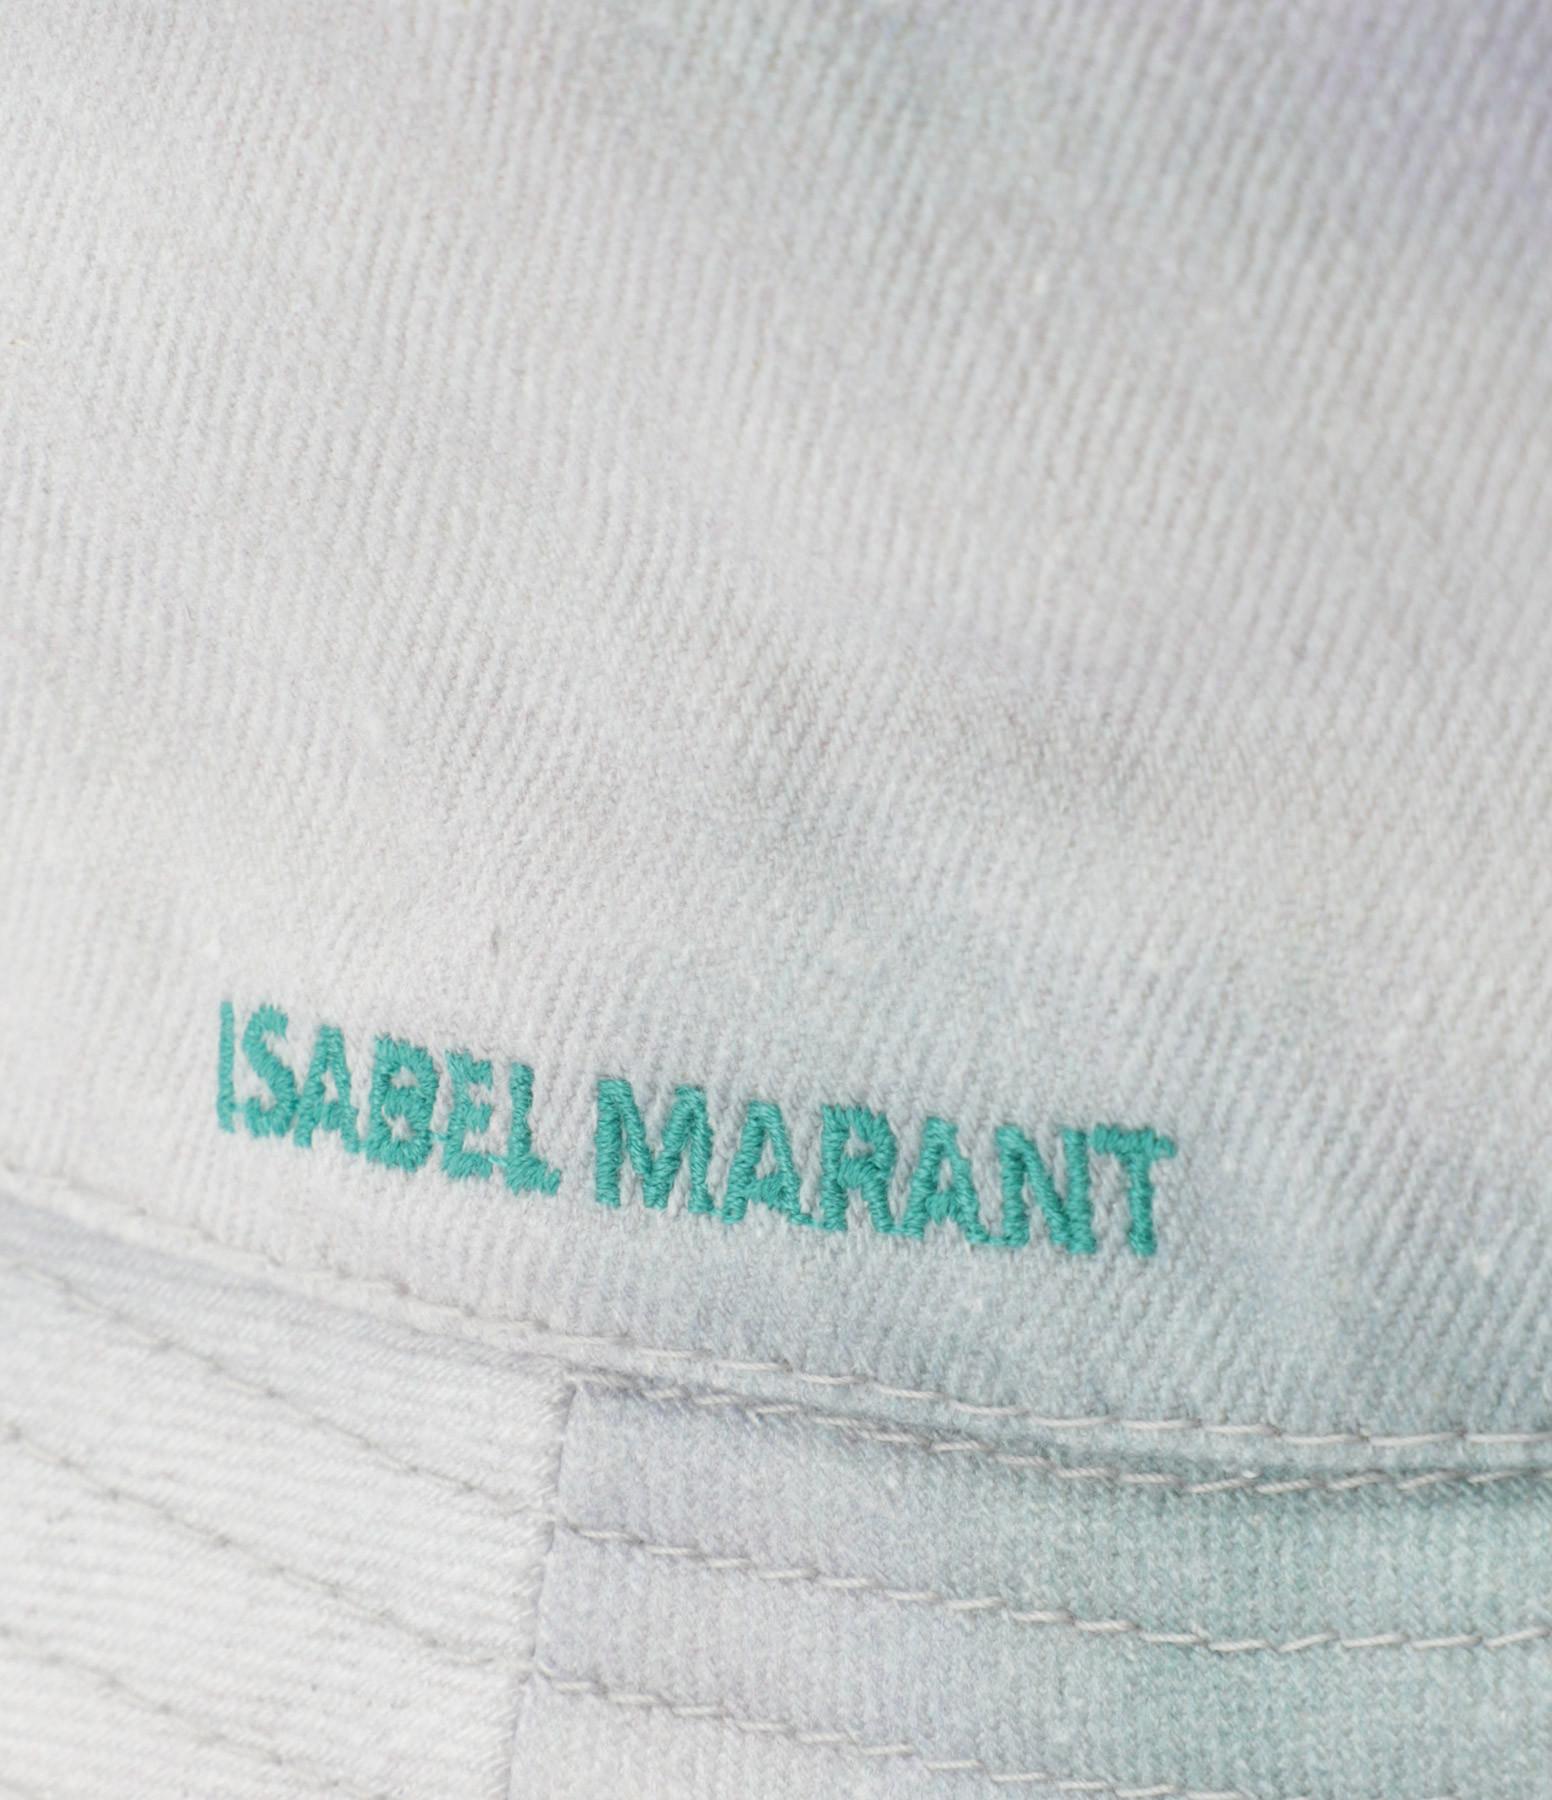 ISABEL MARANT - Bob Haley Coton Tie and Dye Vert